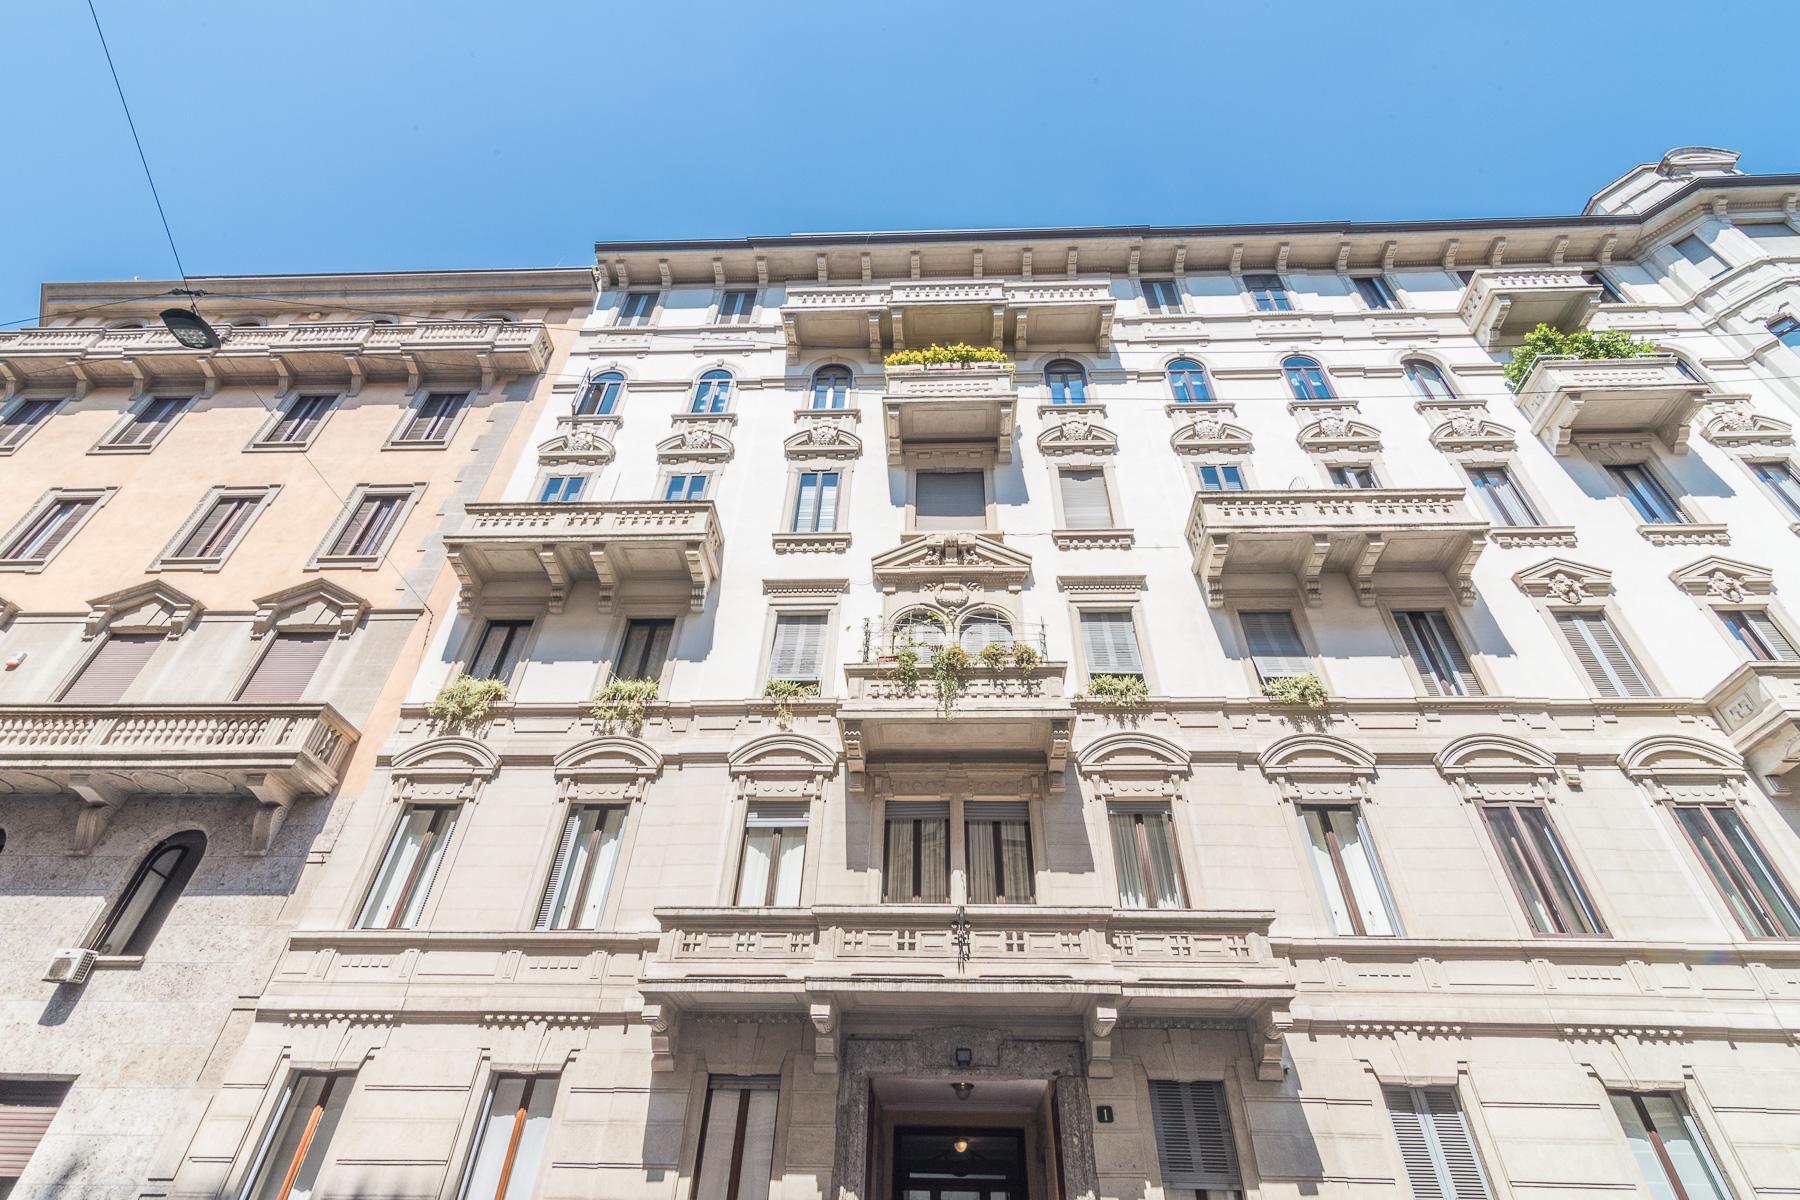 Apartment for Sale at Incomparable apartment in elegant period building Via Vitali Milano, Milan, 20100 Italy